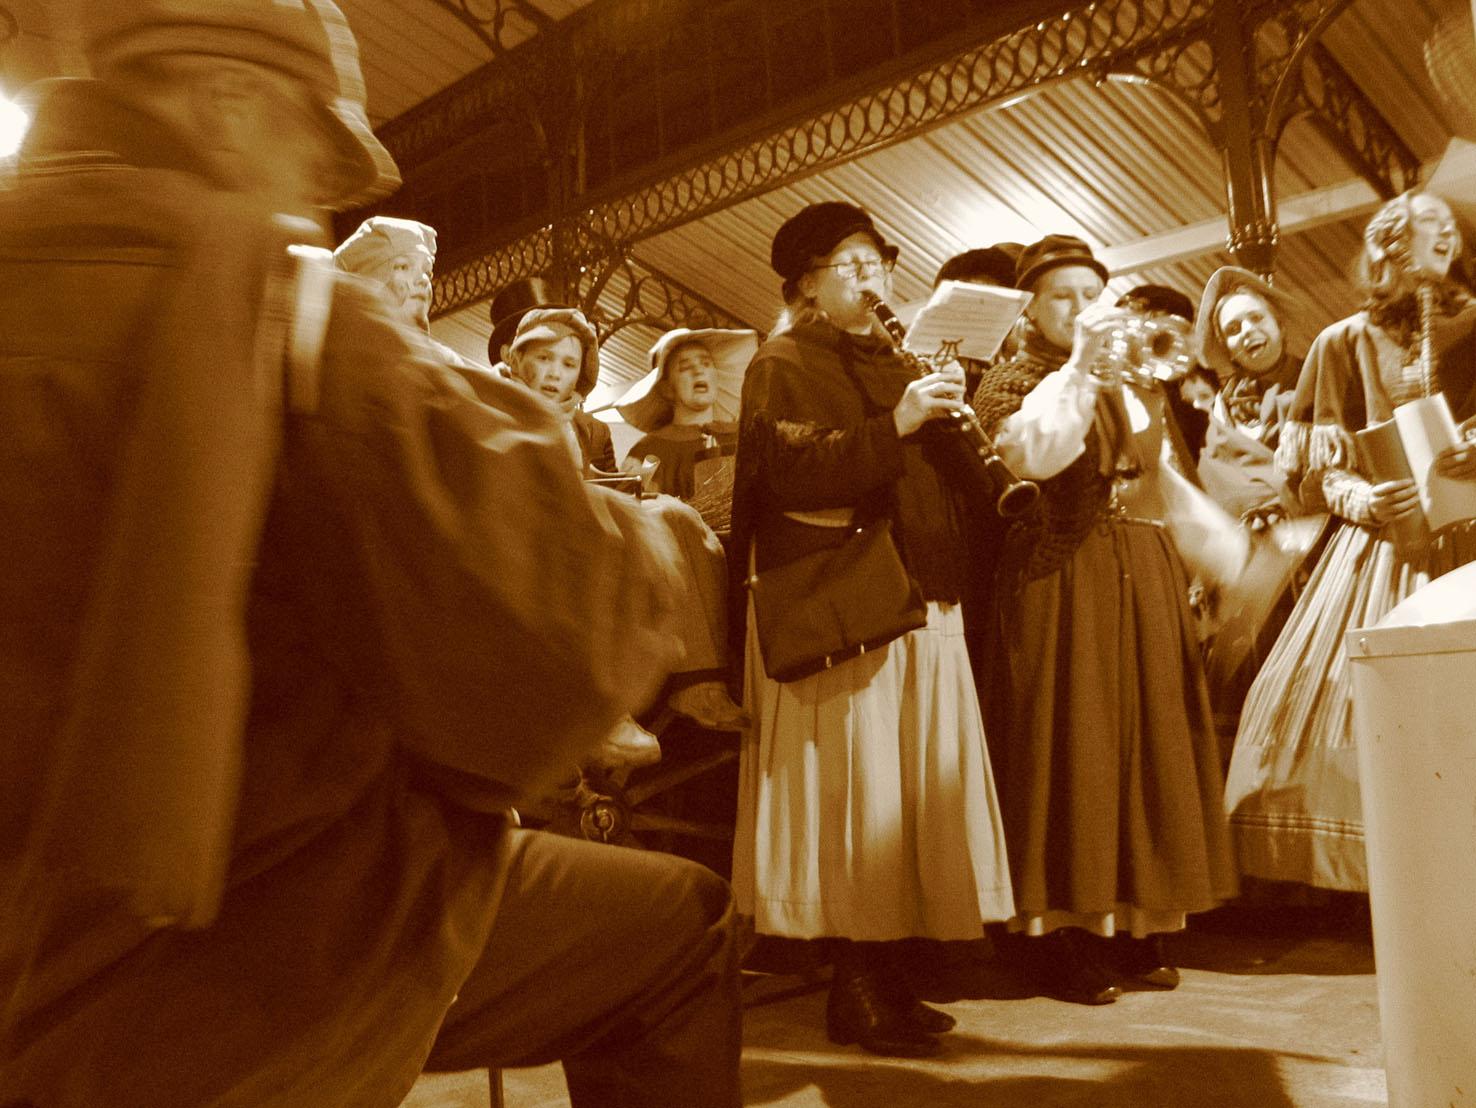 110 - Kerstmarkt Helmond 2003.jpg